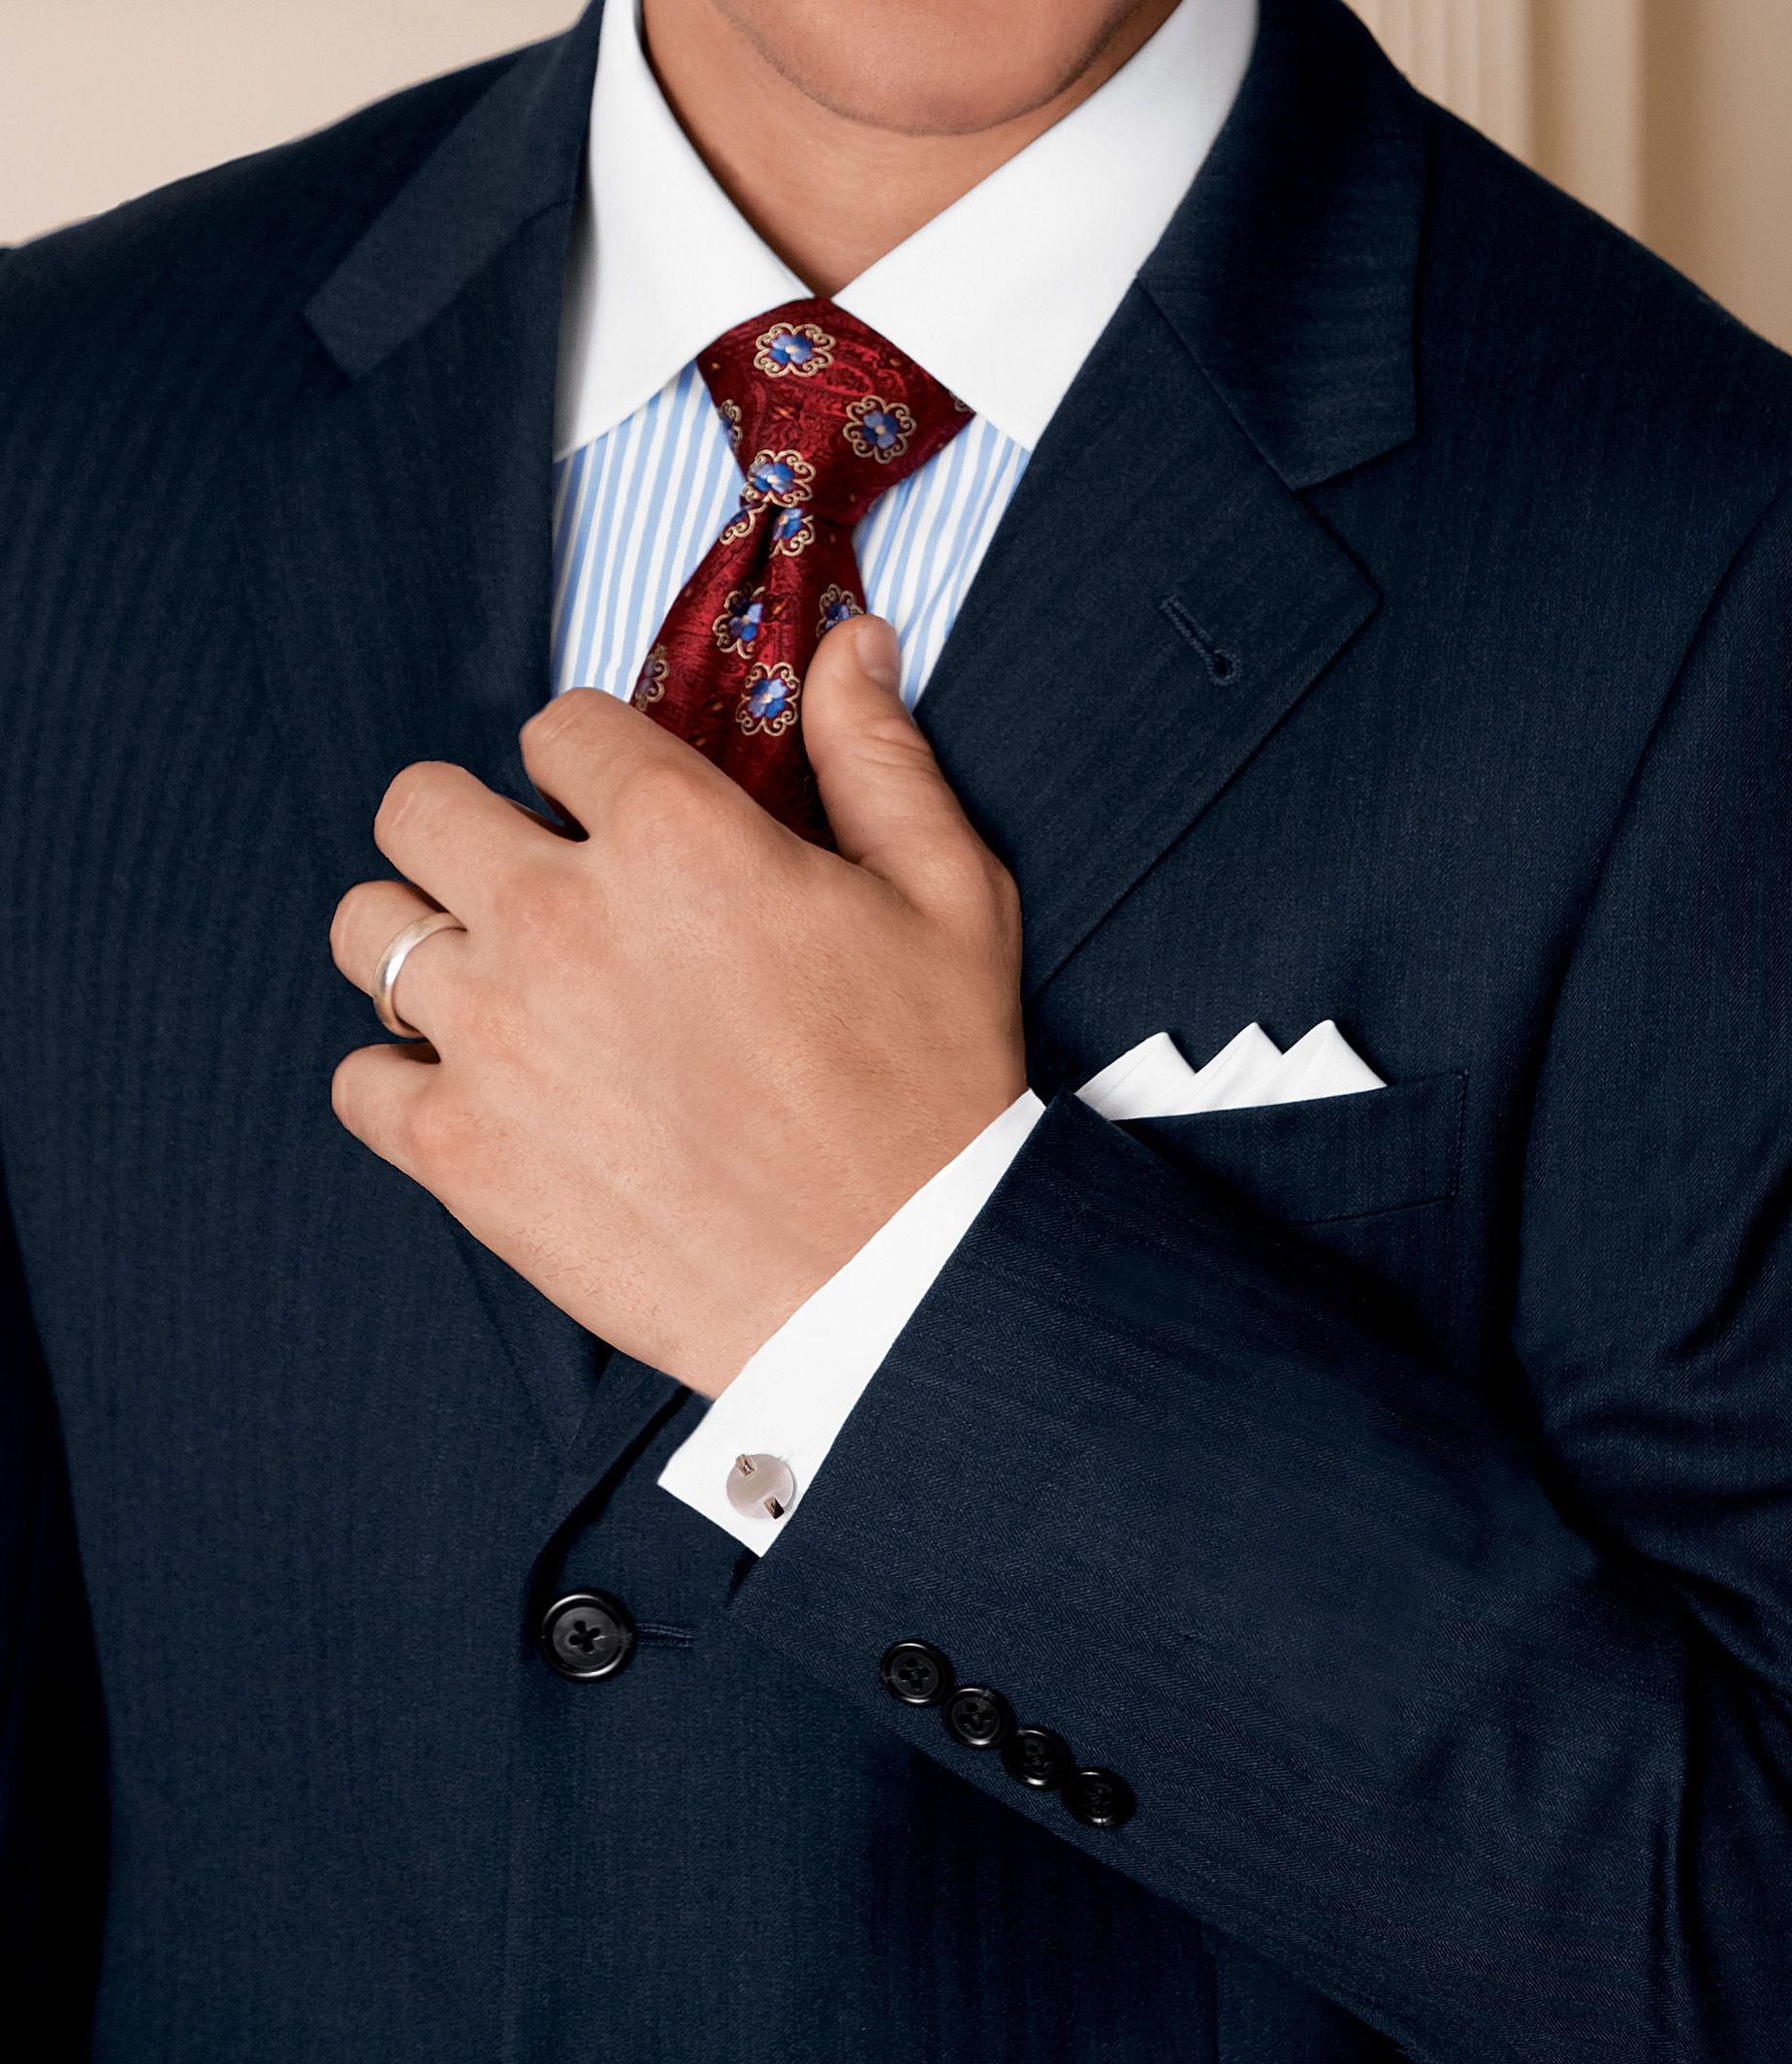 Signature 2-Button Wool Suit- Sizes 44 X-Long-52 - British Tan, Cambridge Grey, Charcoal Herringbone, Navy Herringbone